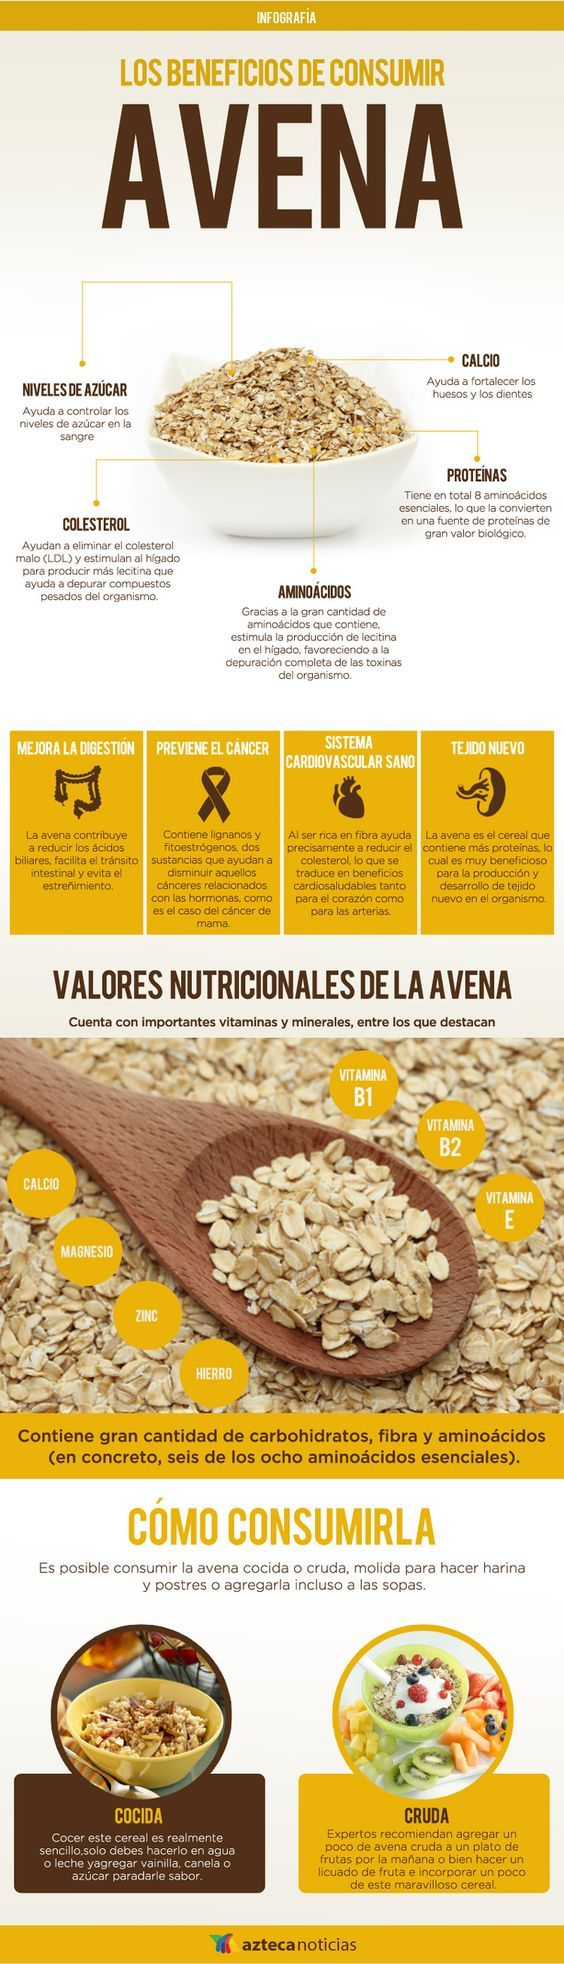 Los beneficios de consumir avena #infografia: